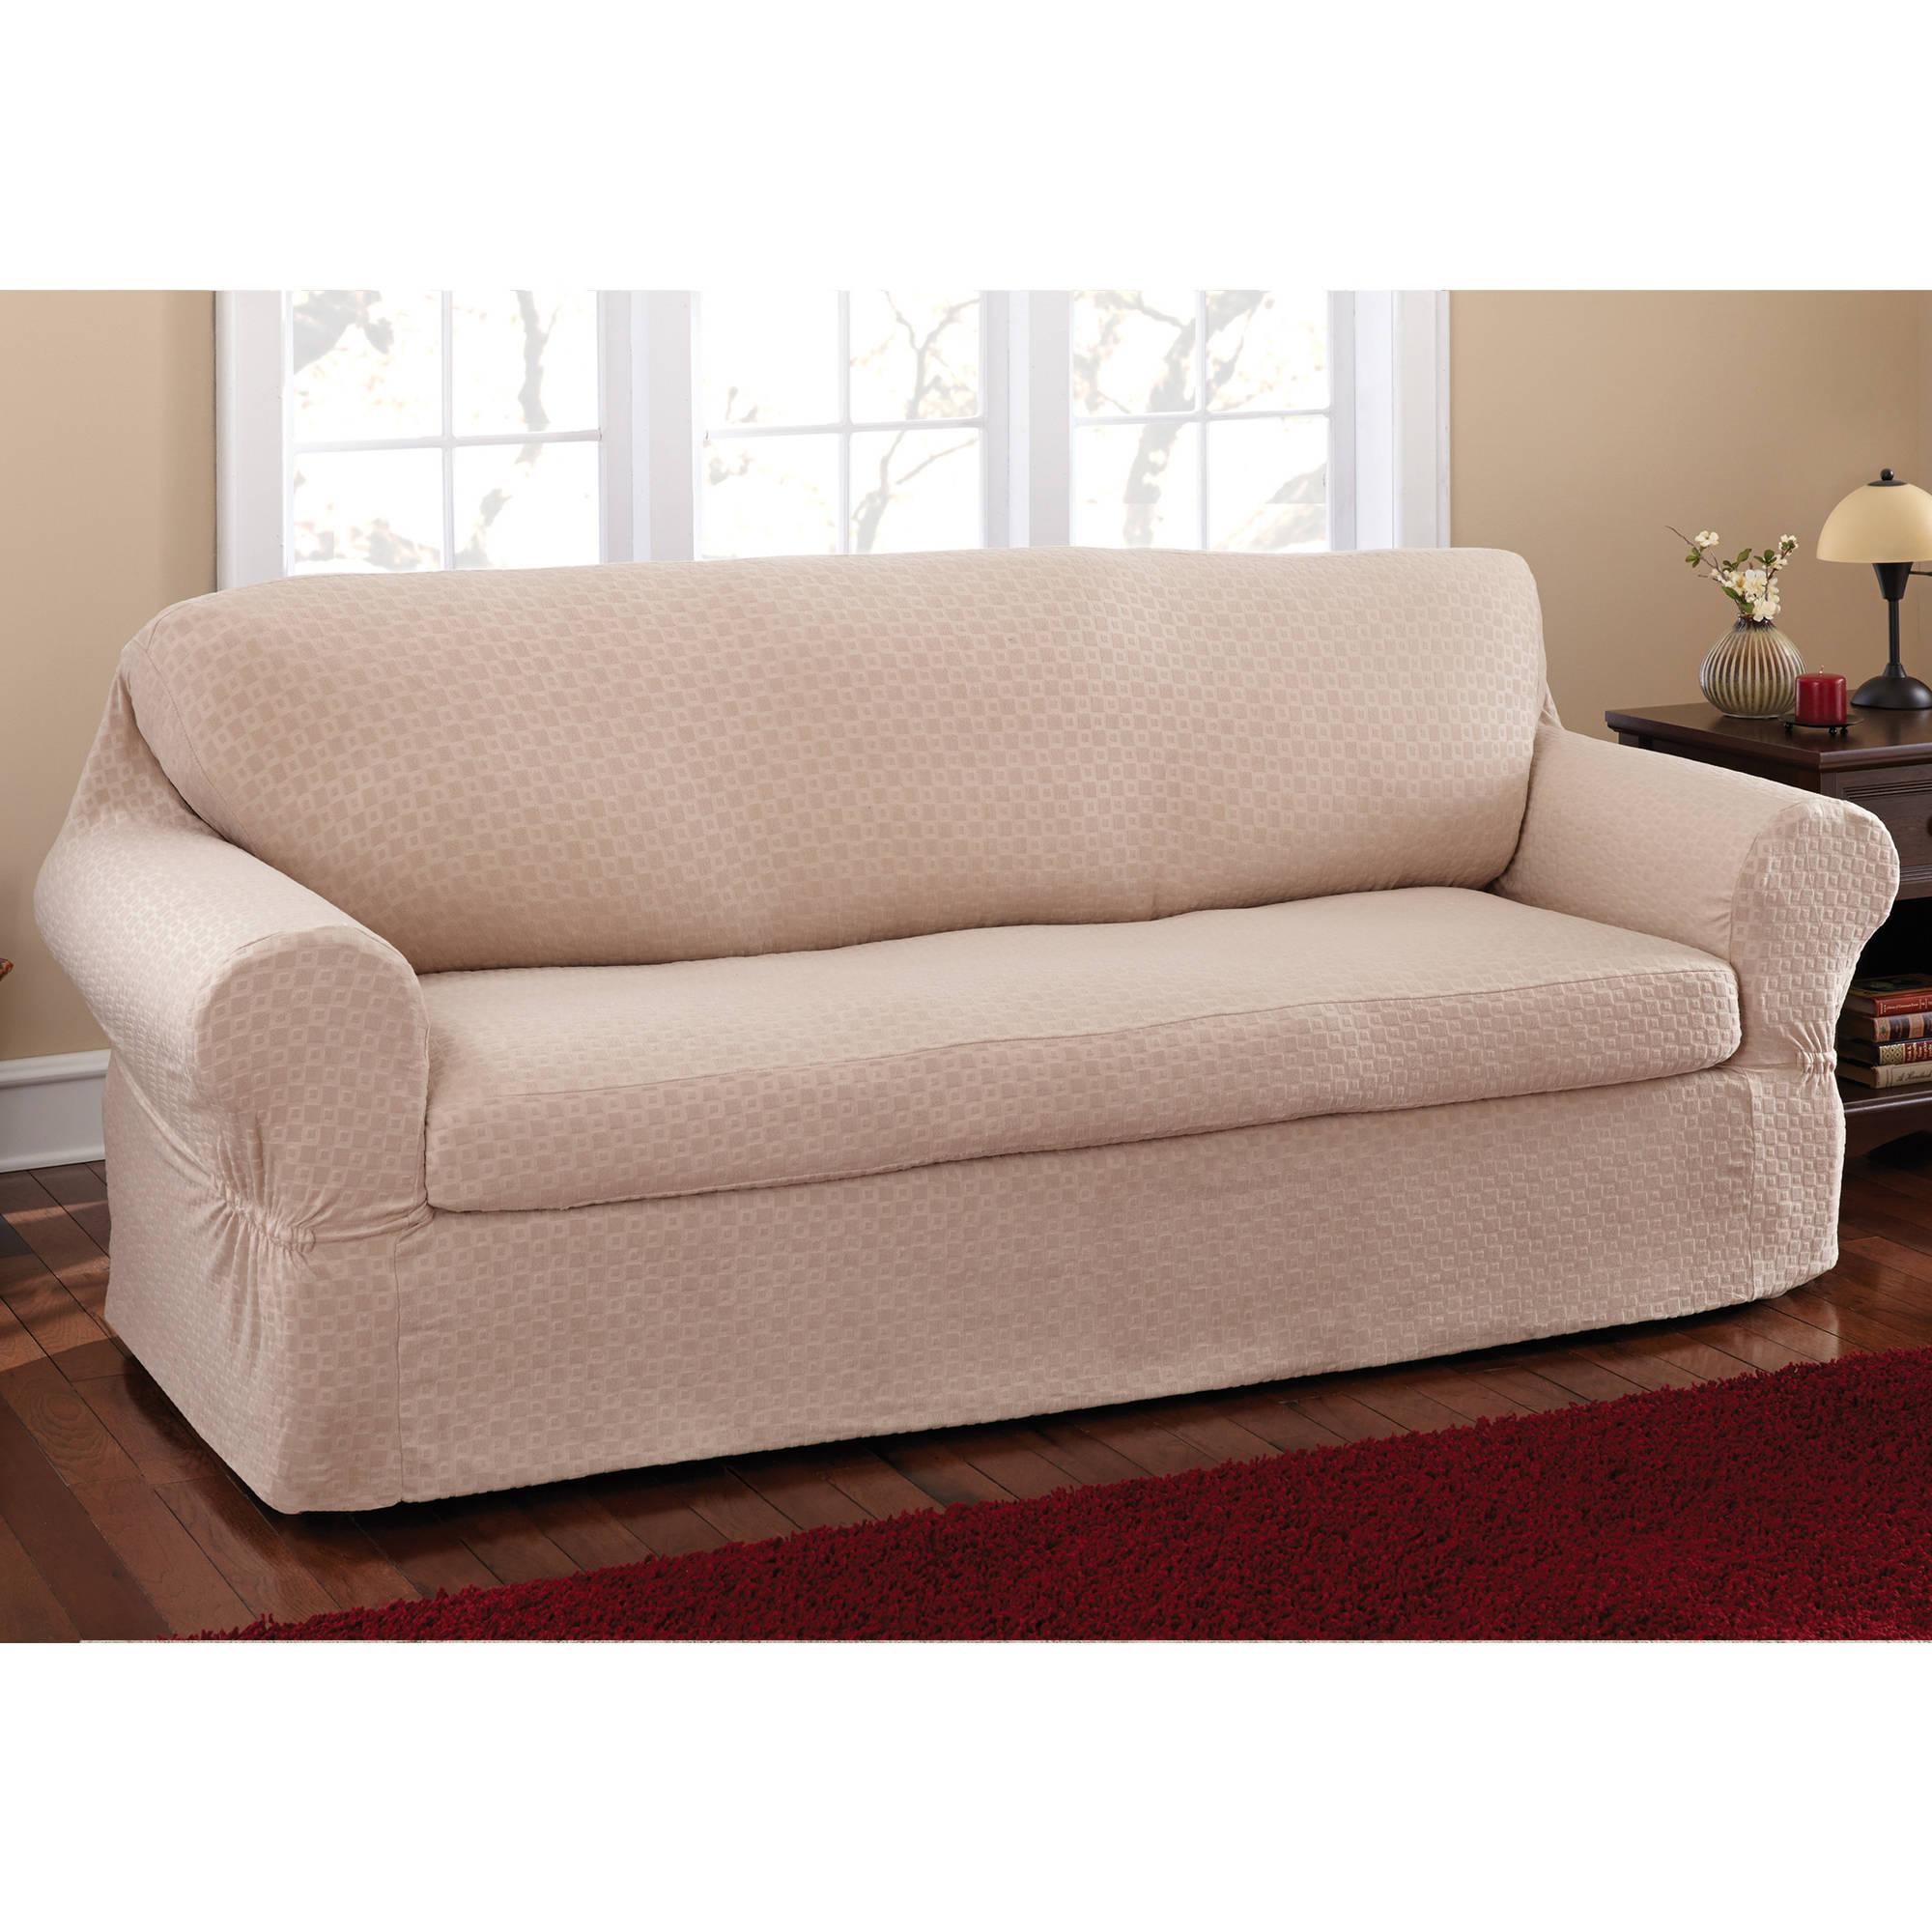 Mainstays Conrad 2 Piece Sofa Slipcover Walmart